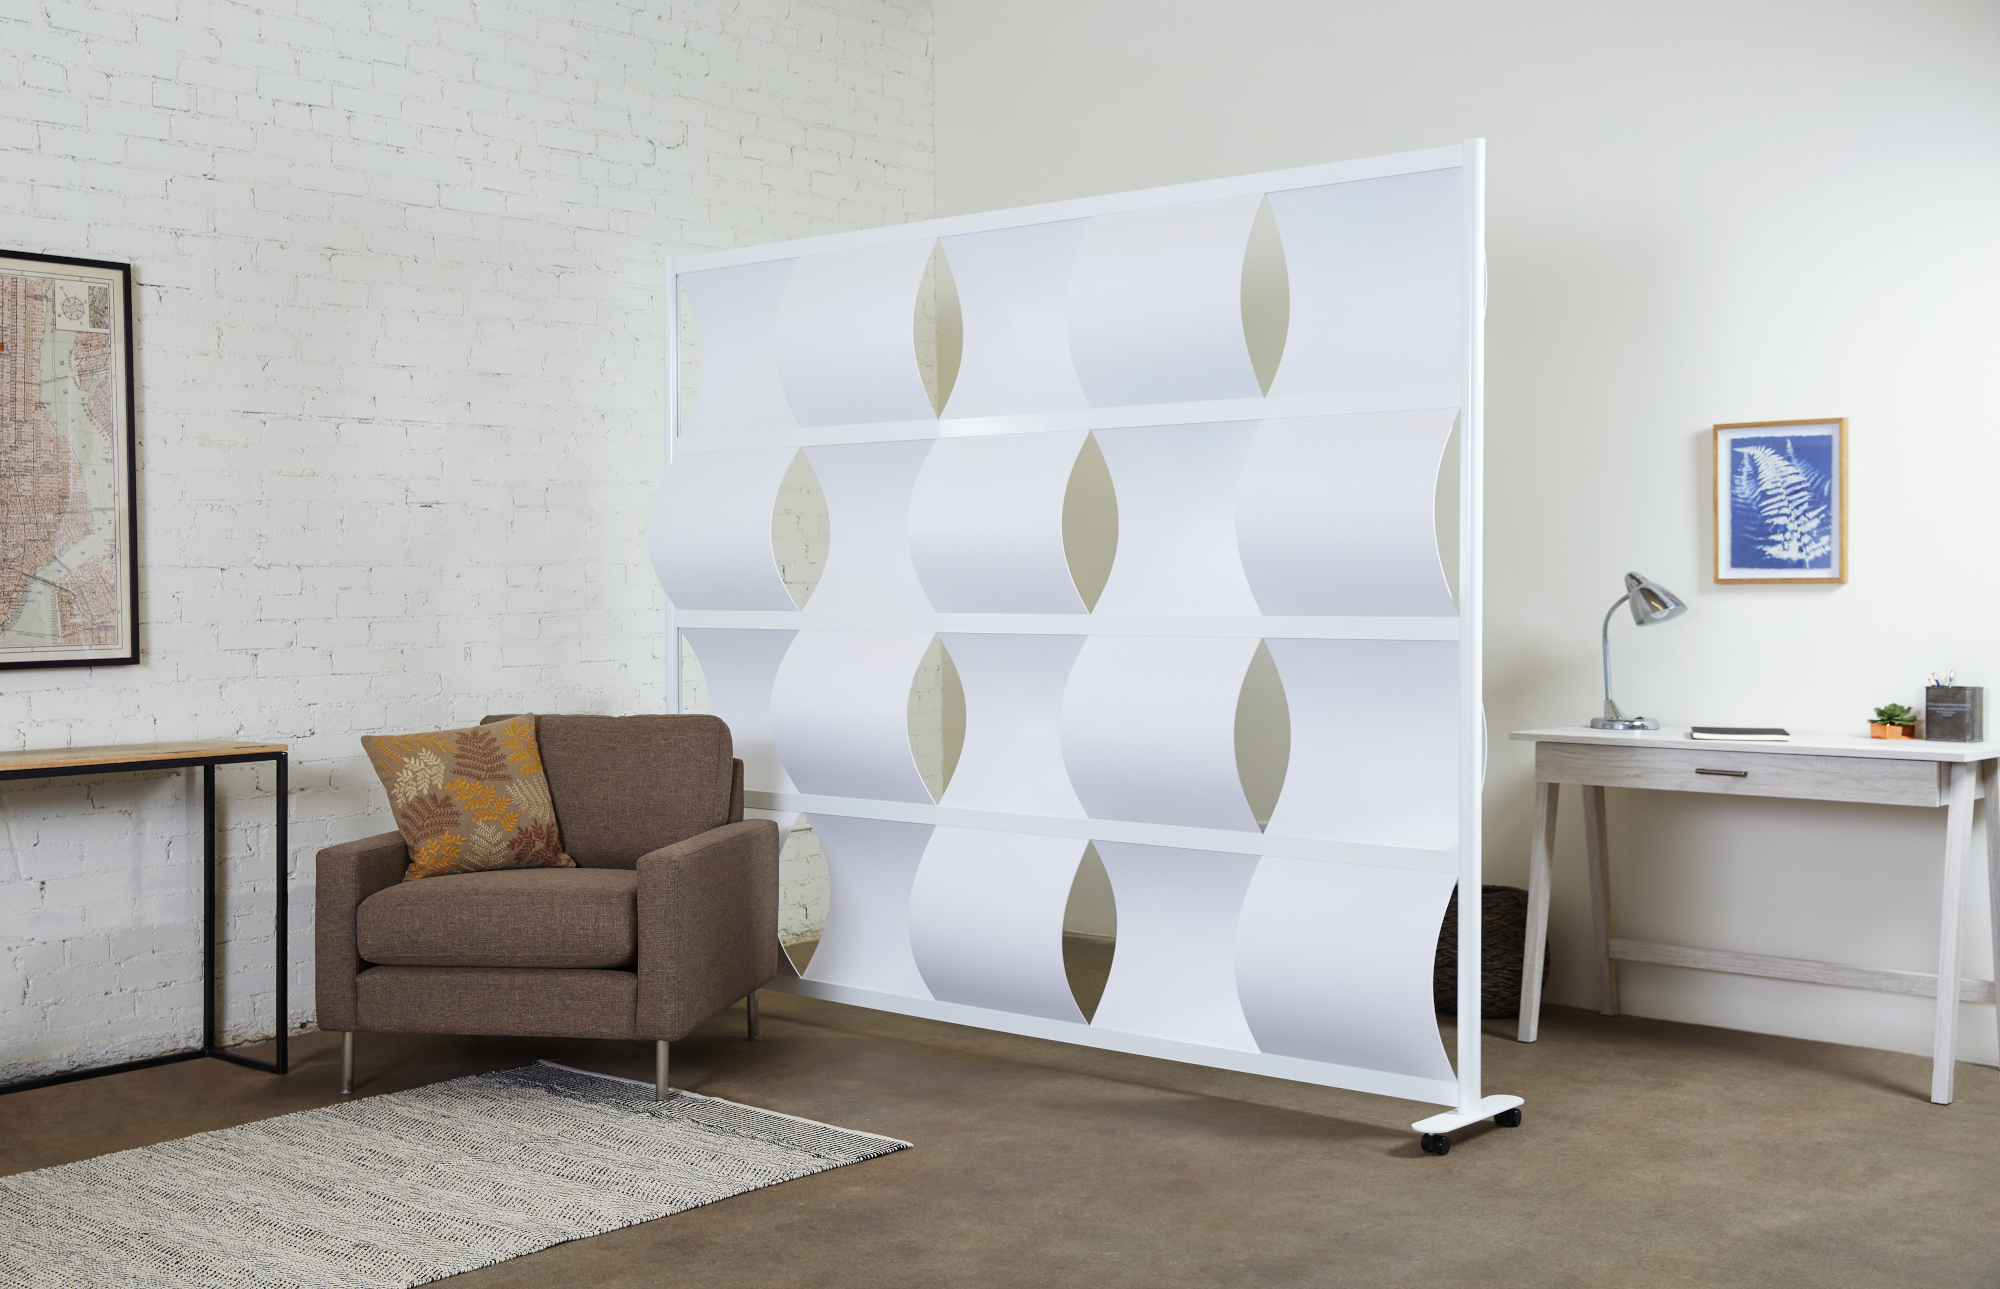 8-w-wave-white-powdercoat-caster-base-white-panels-environmentsm.jpg